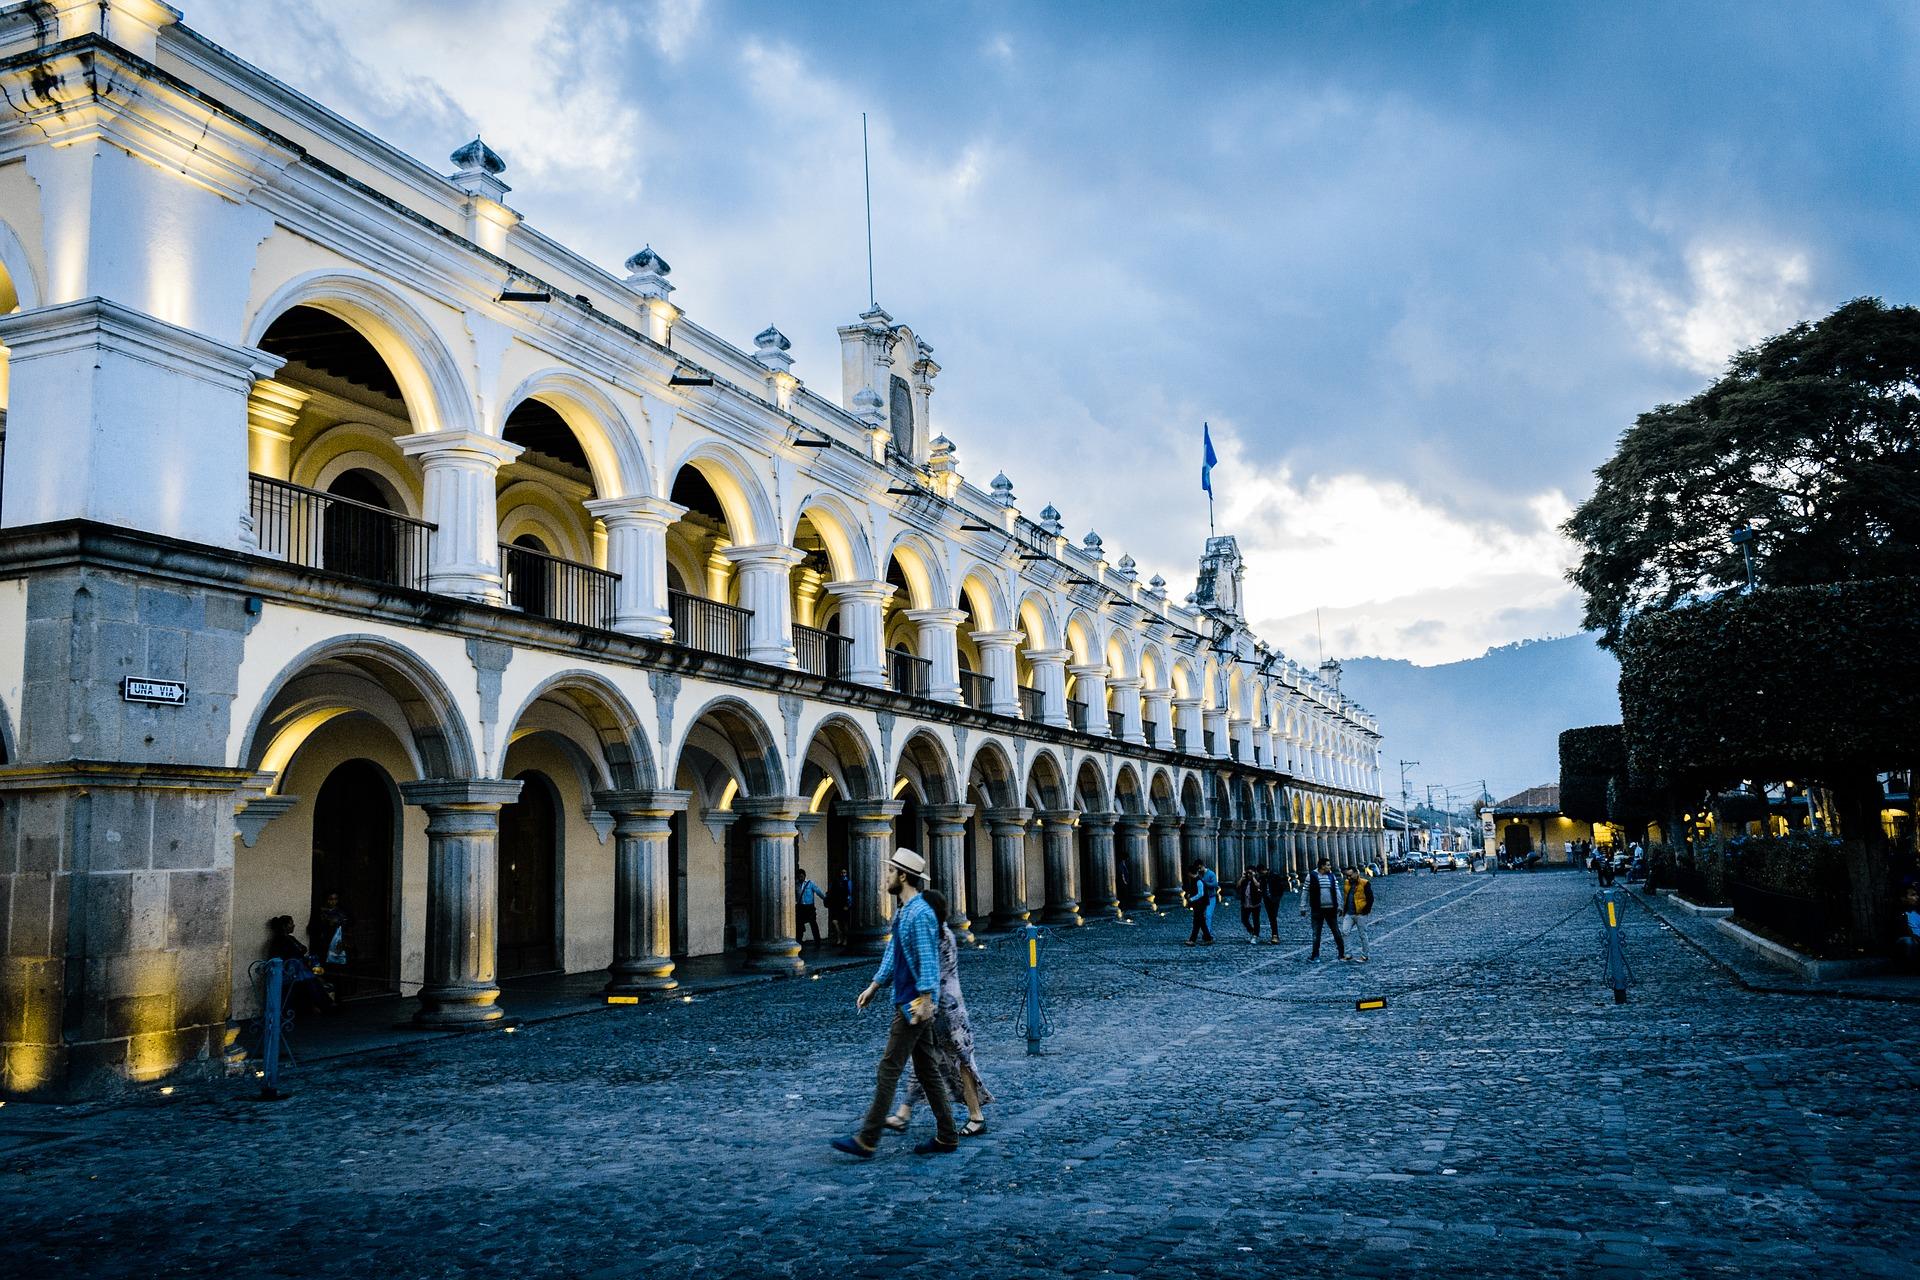 persona caminando sobre la Plaza de la Antigua Guatemala